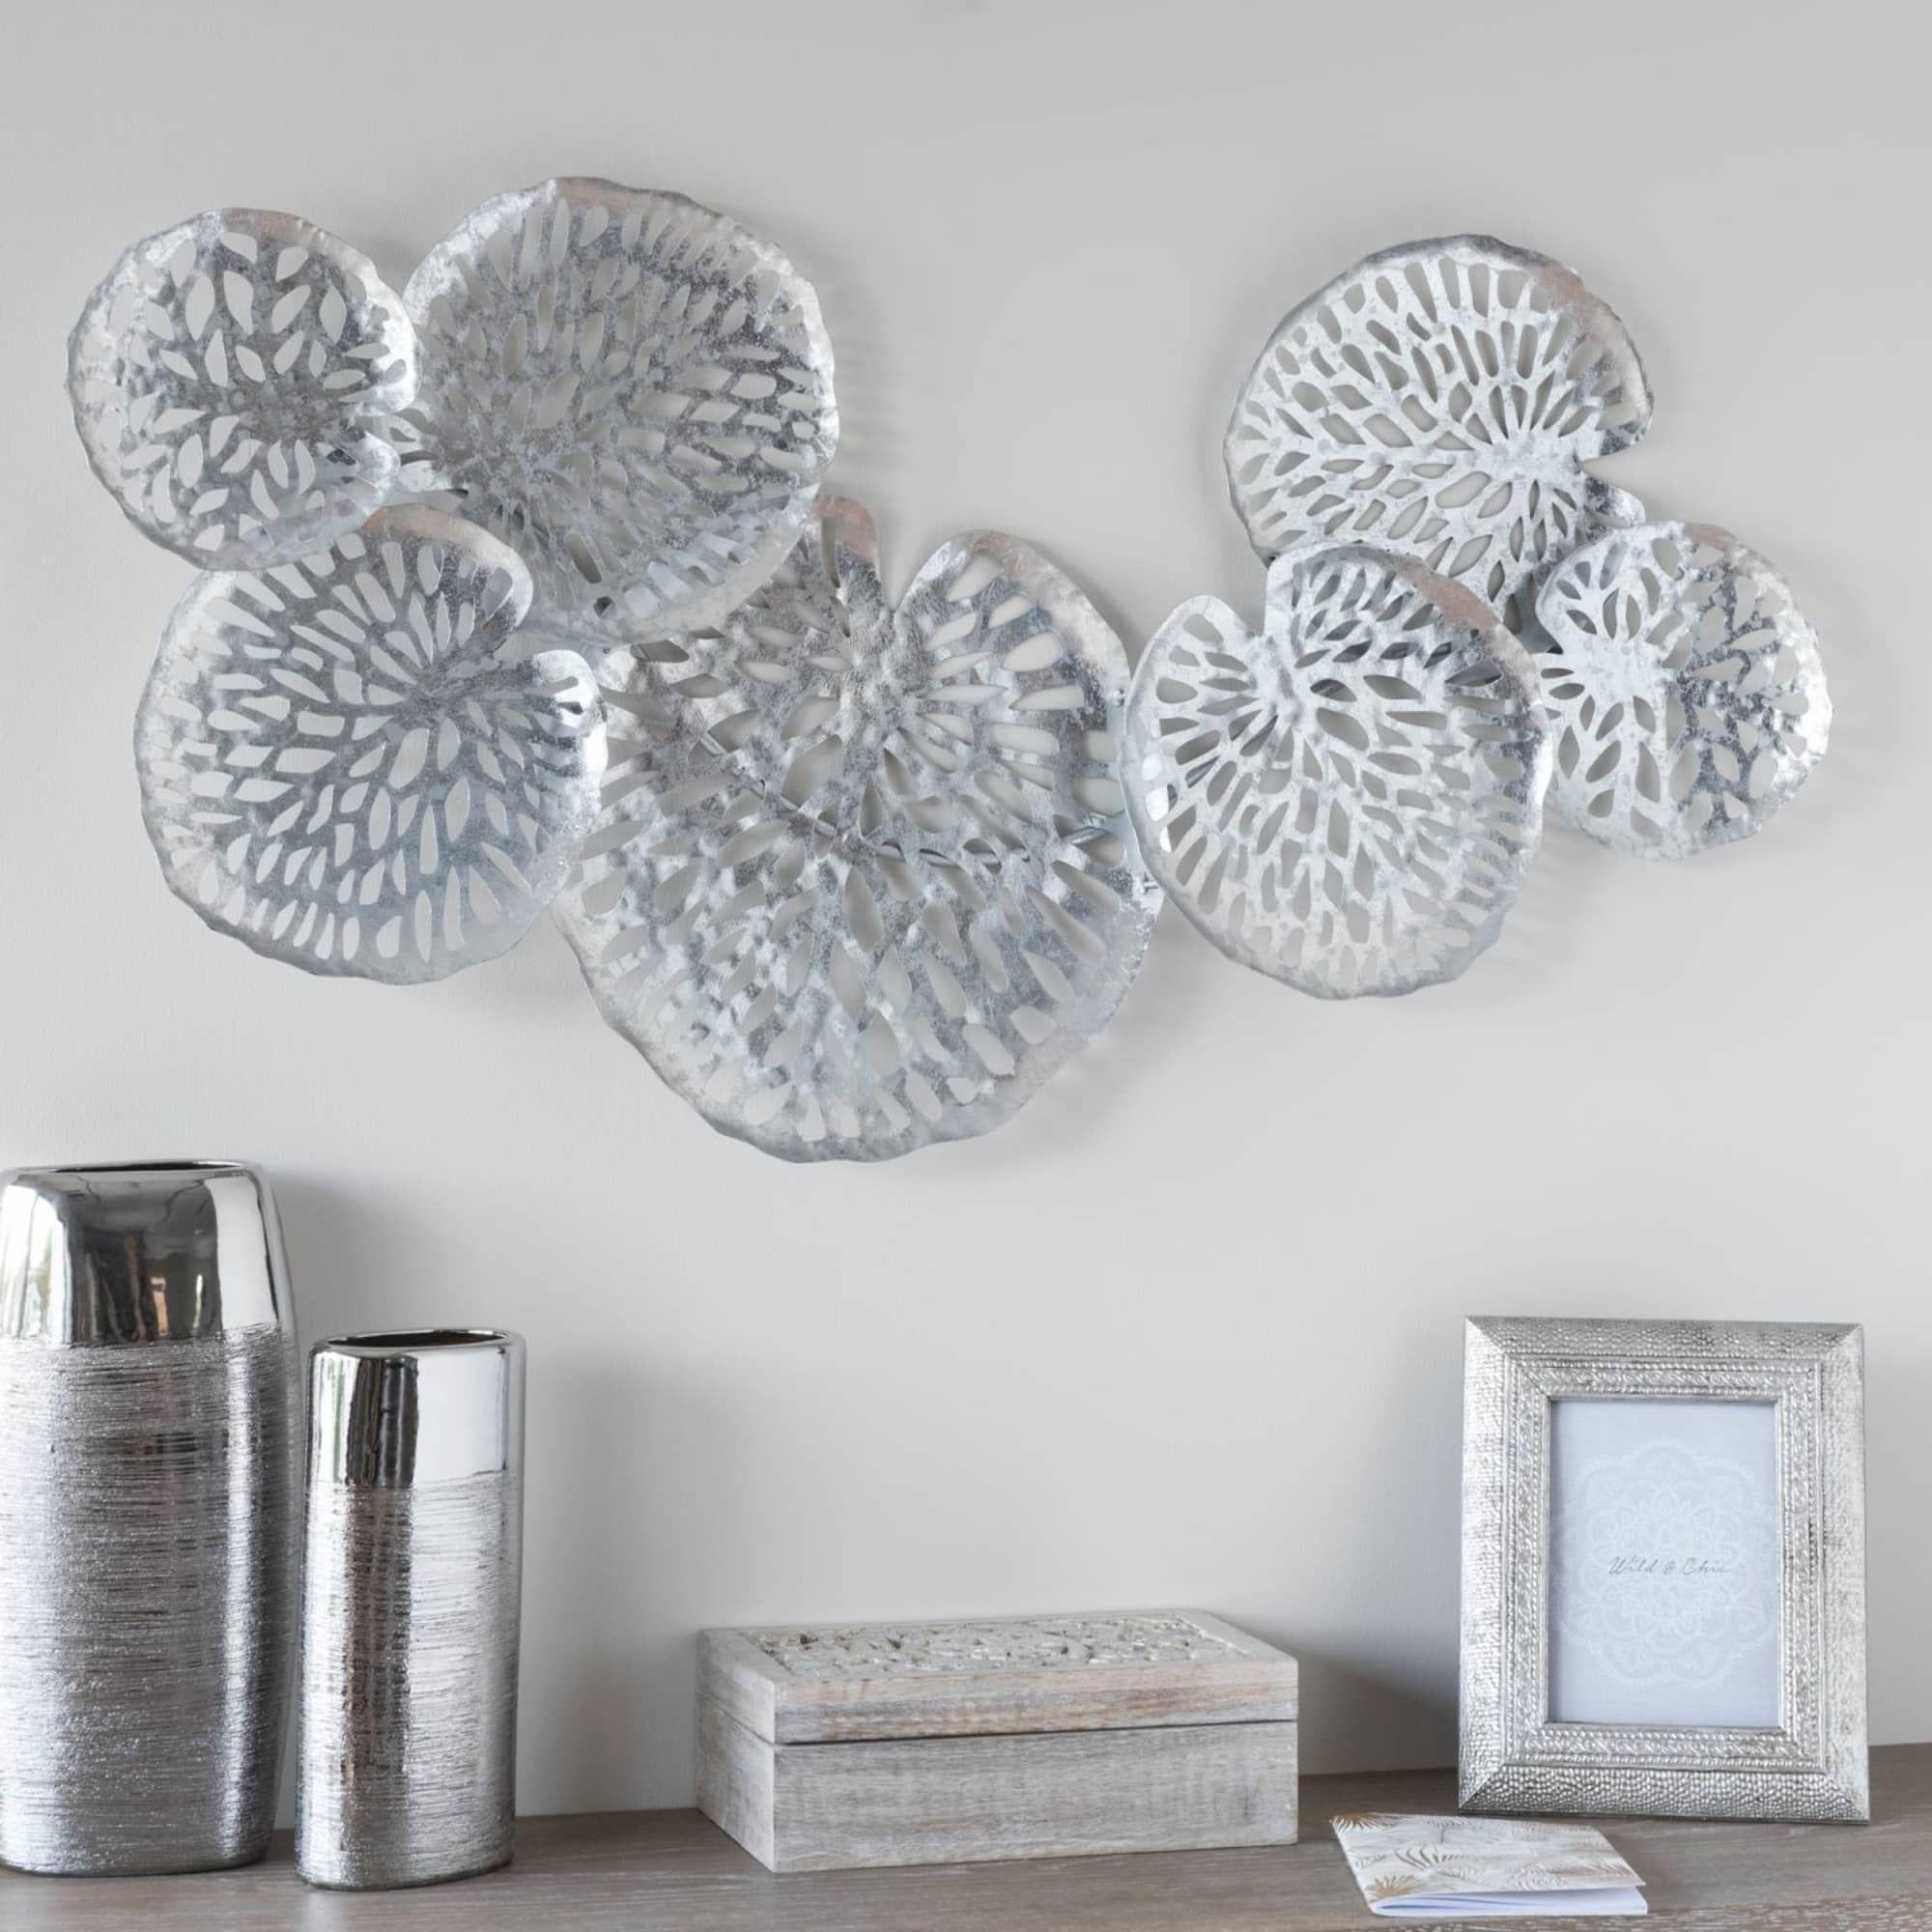 Wall Plaques Door Plaques Lettering Typography Blocks Silver Wall Art Metal Wall Art Living Room Metal Wall Art Decor